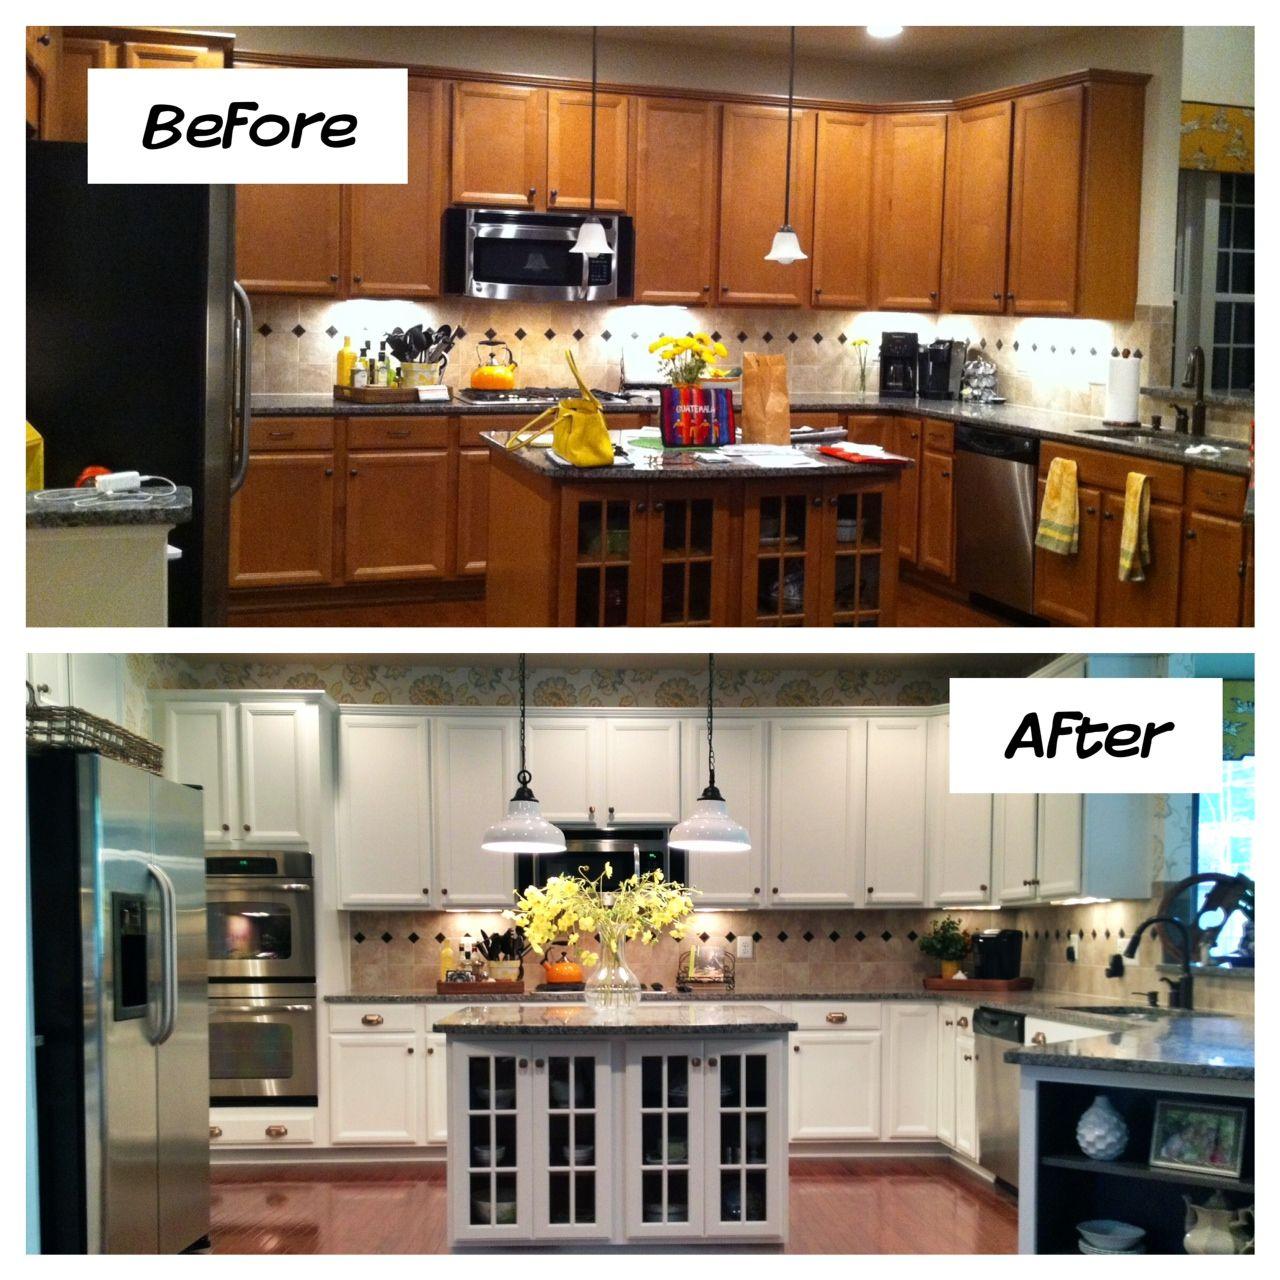 How To Make Oak Kitchen Cabinets Look Modern Einteriors Us Repainting Kitchen Cabinets Refinish Kitchen Cabinets Kitchen Remodel Small